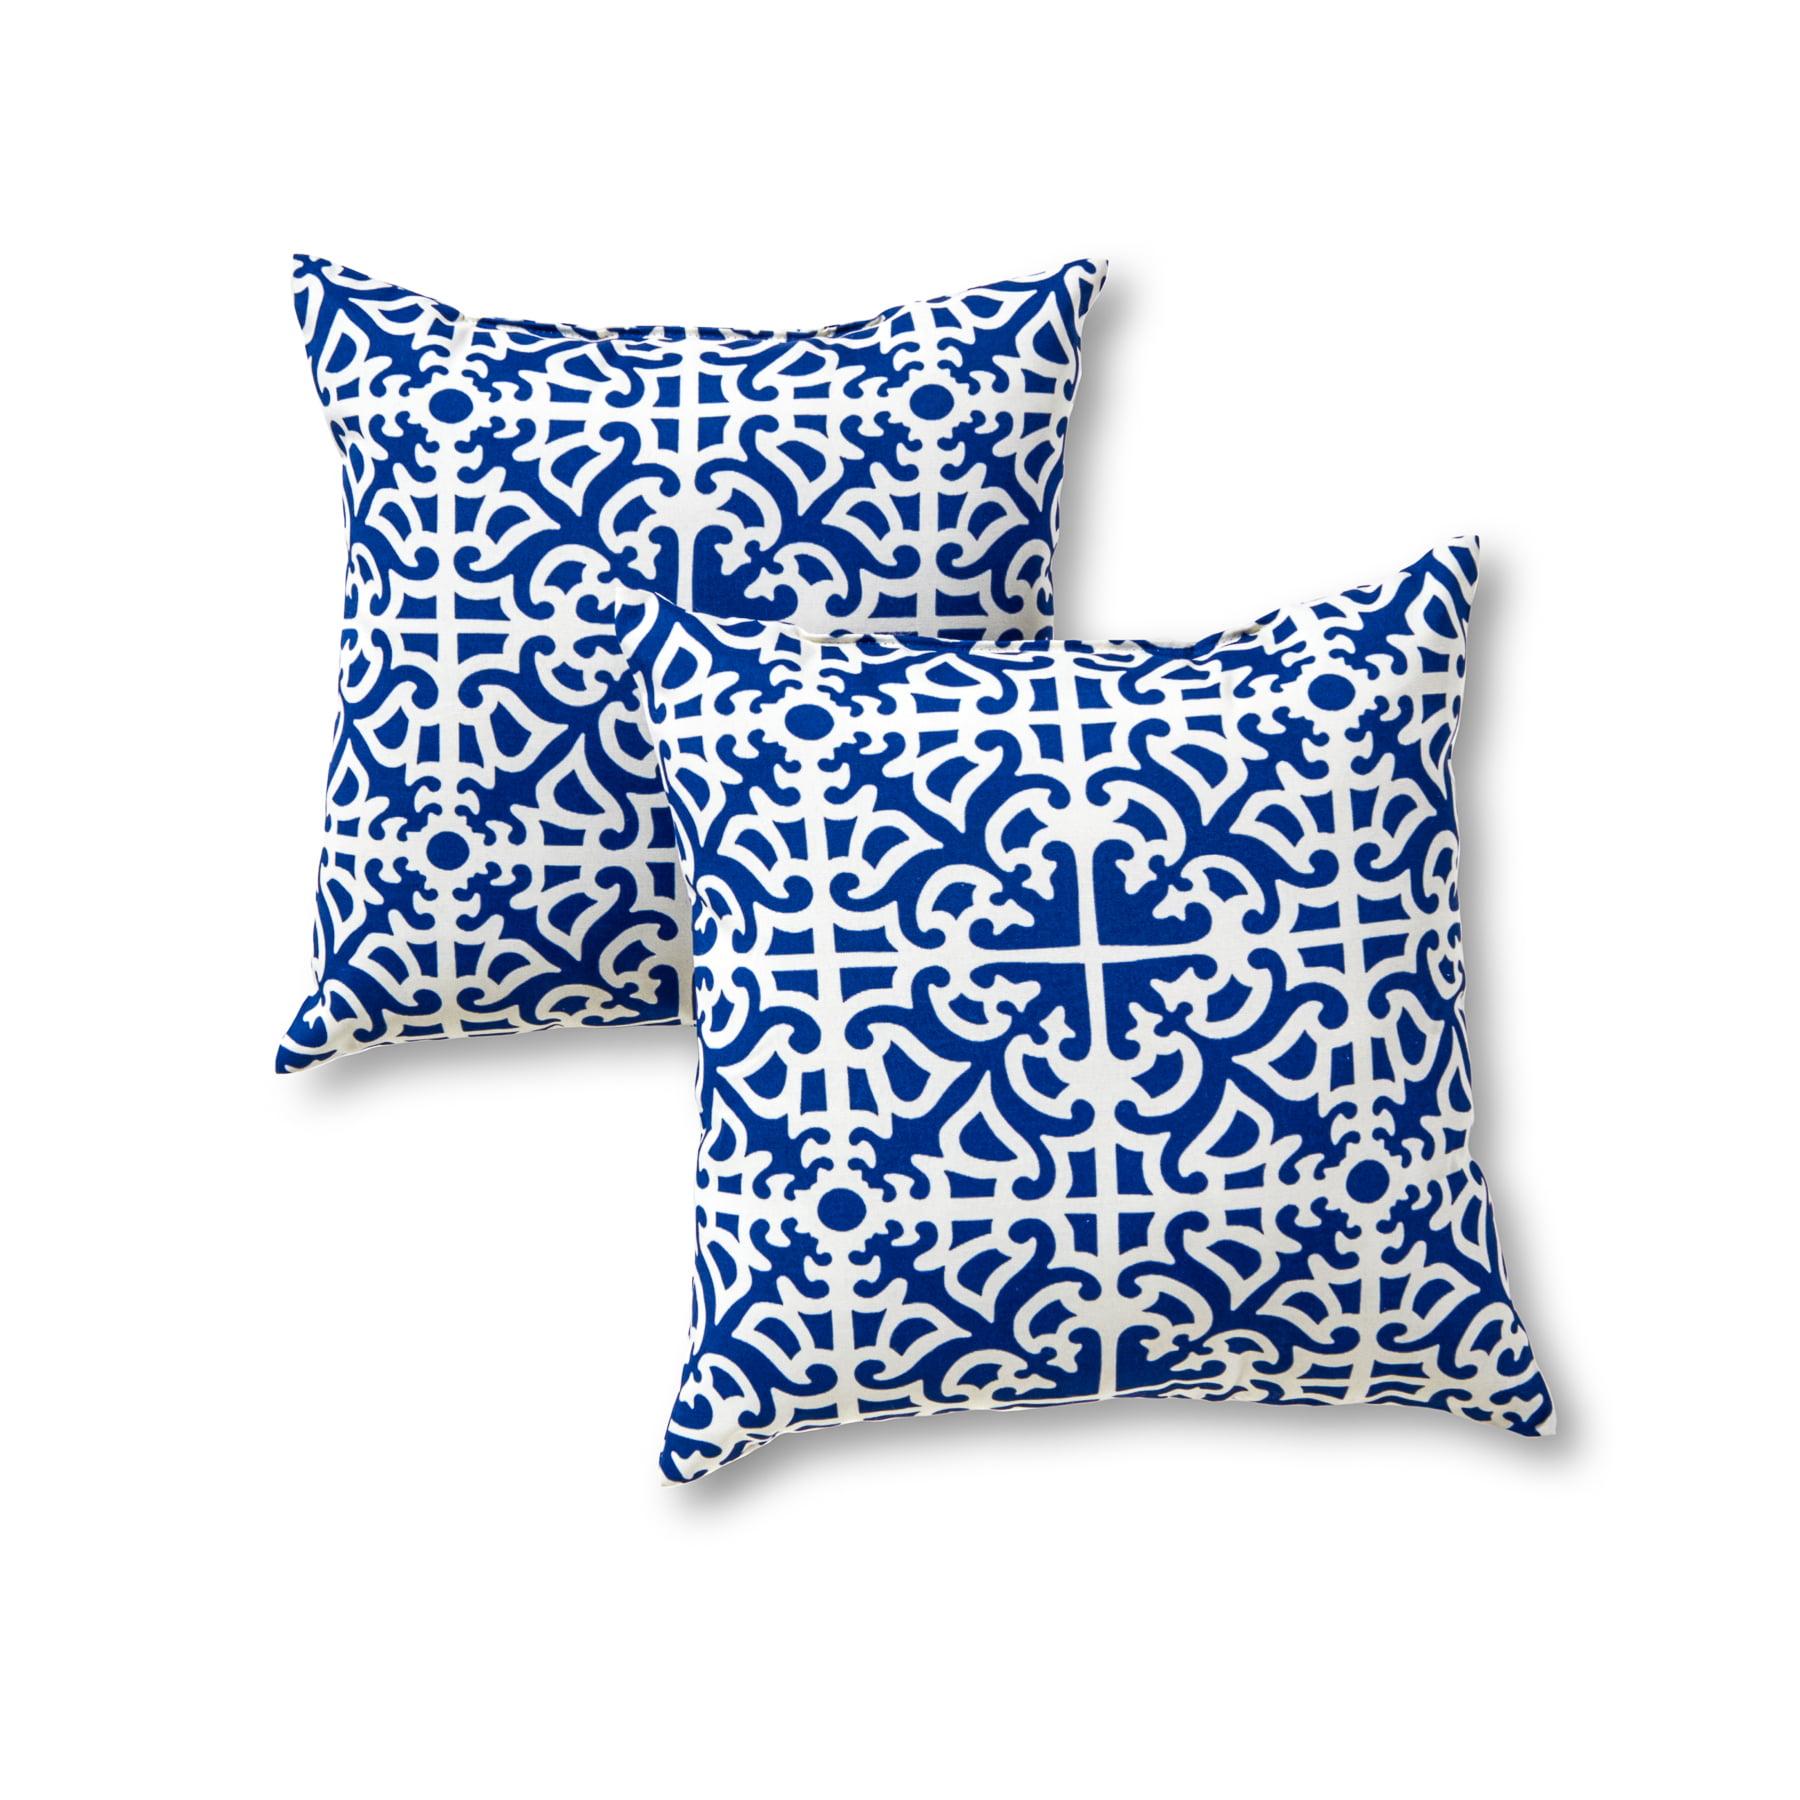 Lattice 17 x 17 in. Outdoor Accent Pillow, Set of 2